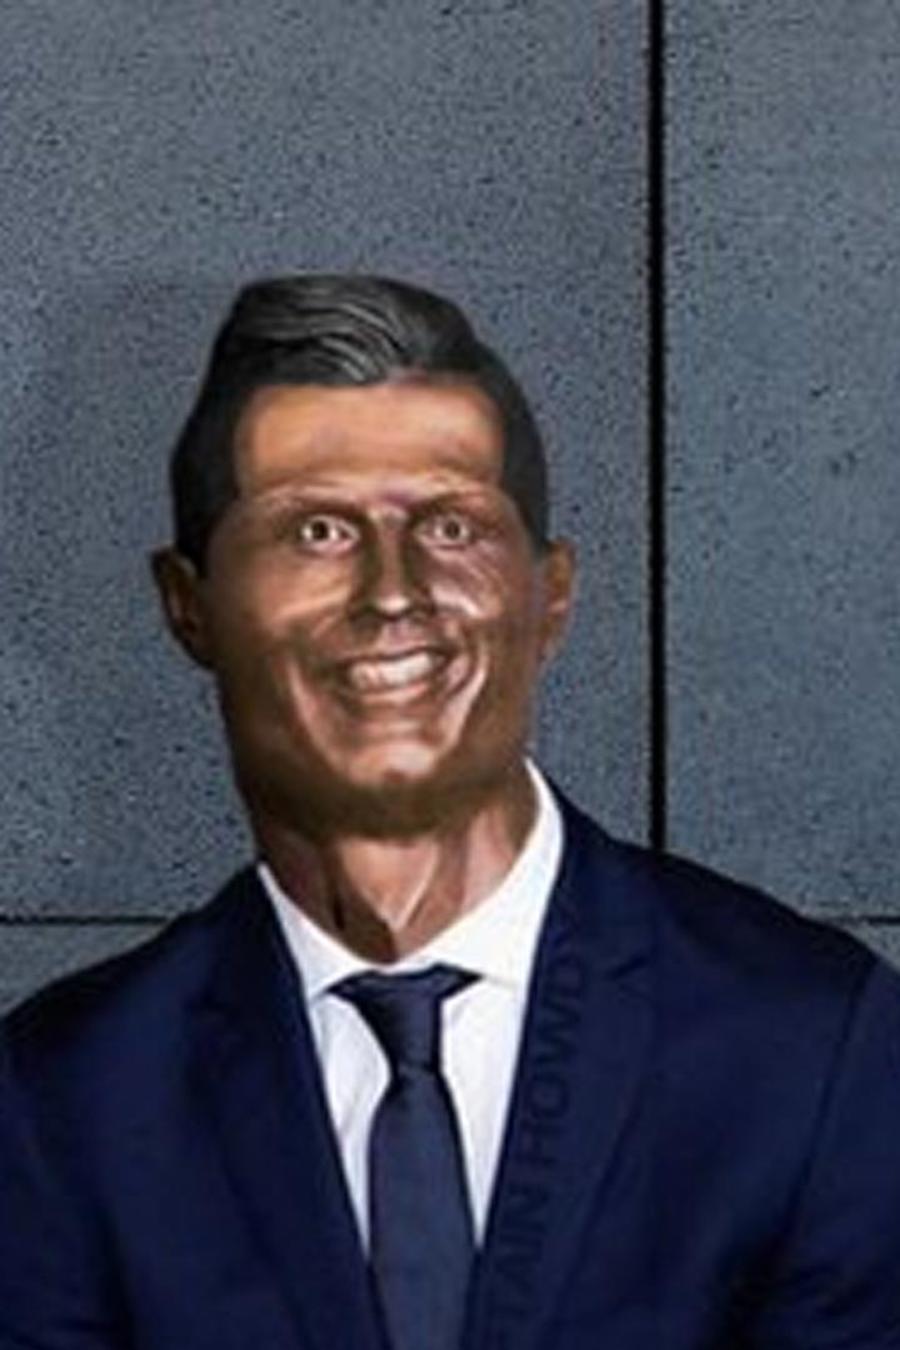 Meme busto Cristiano Ronaldo